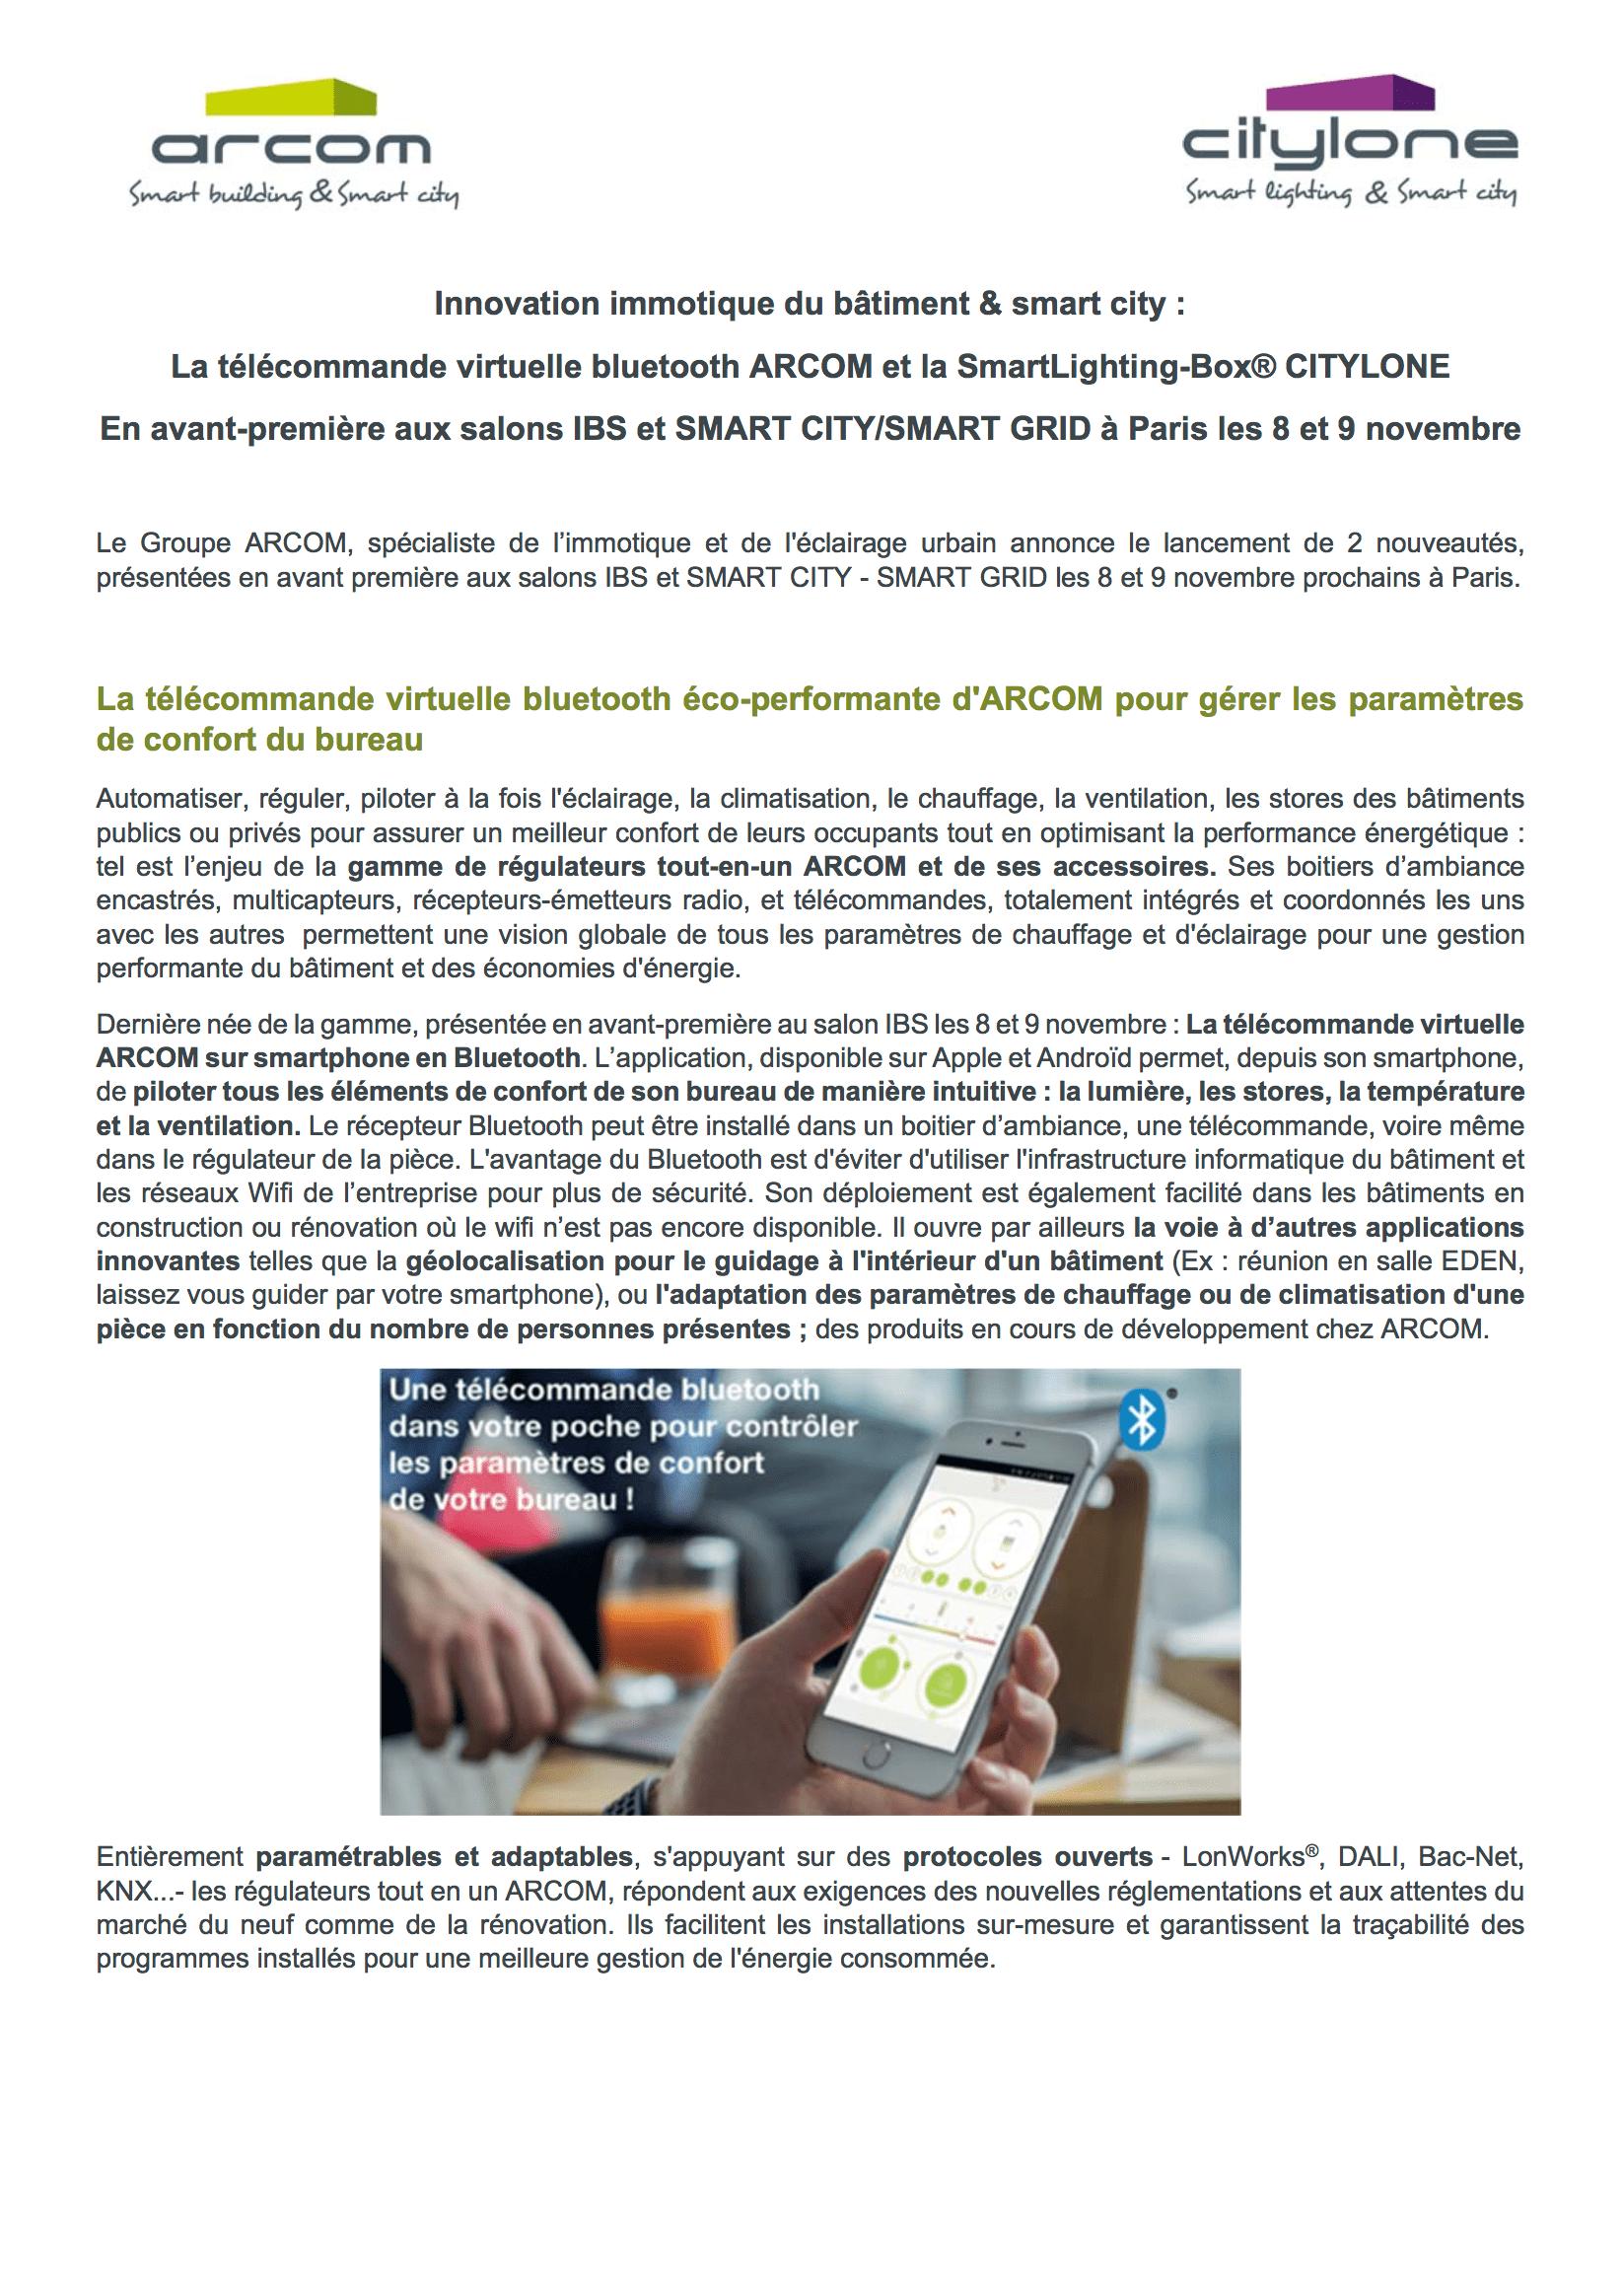 communique-de-presse-arcom-salons-ibs-smartgrid-smartcity-cover